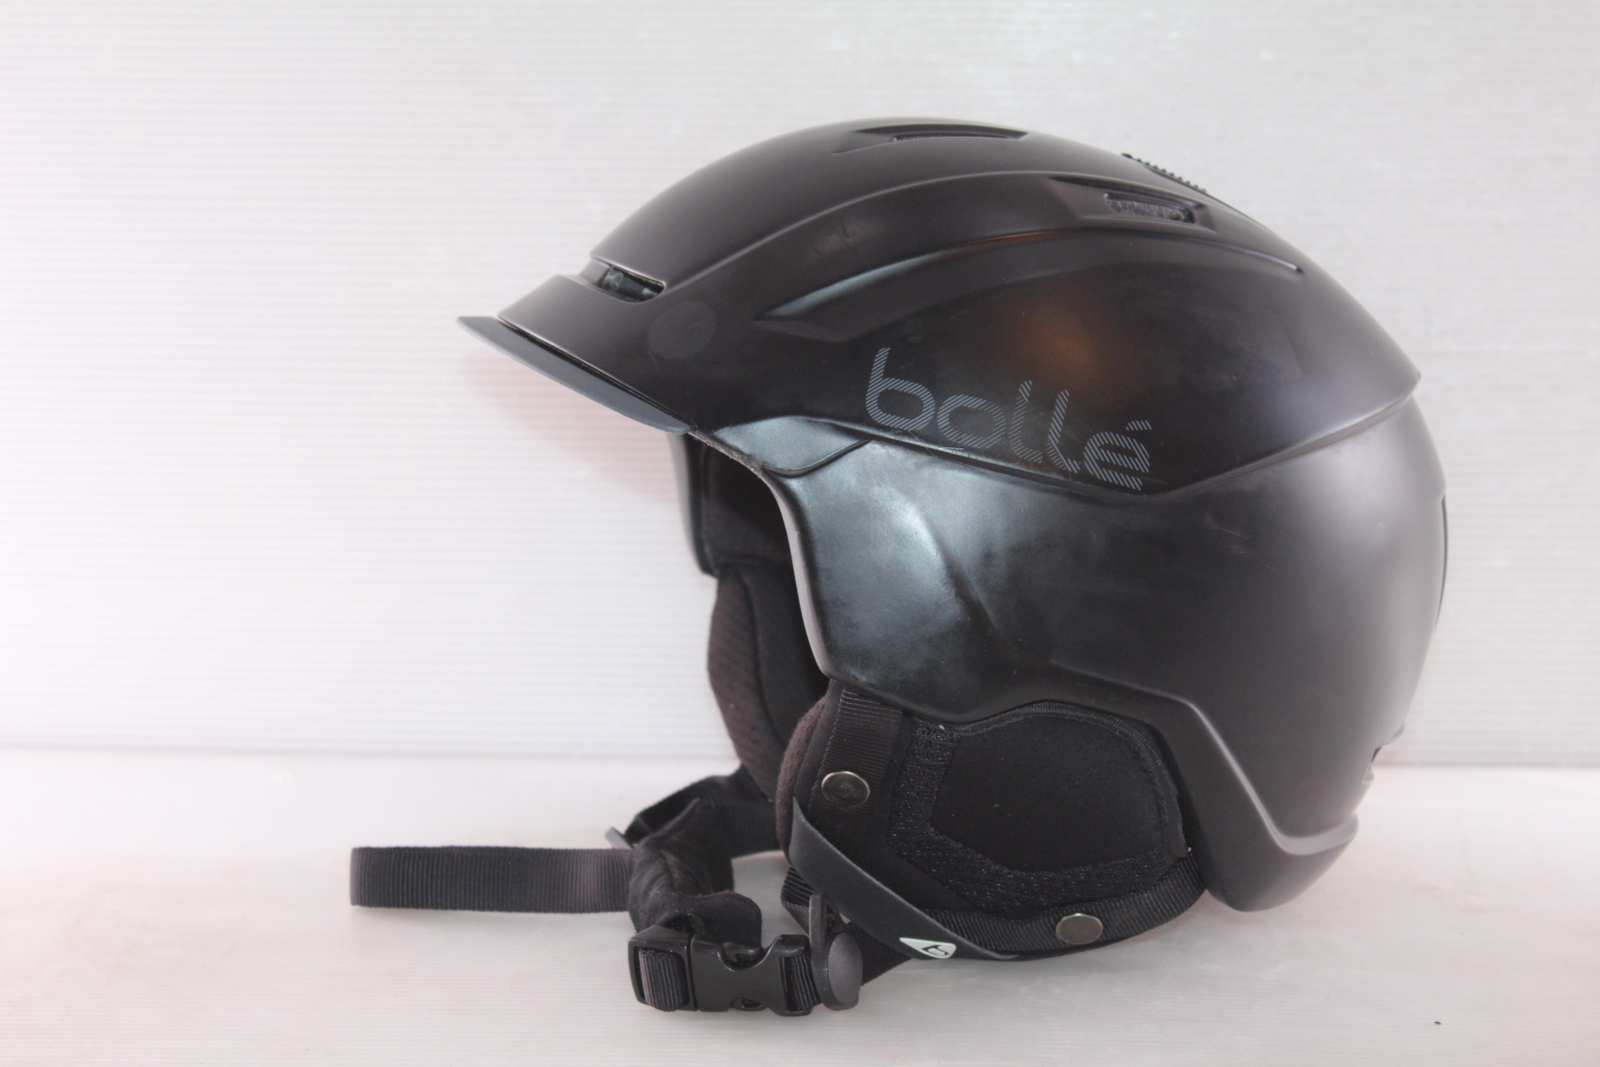 Lyžařská helma Bolle Instinct - posuvná vel. 58 - 61